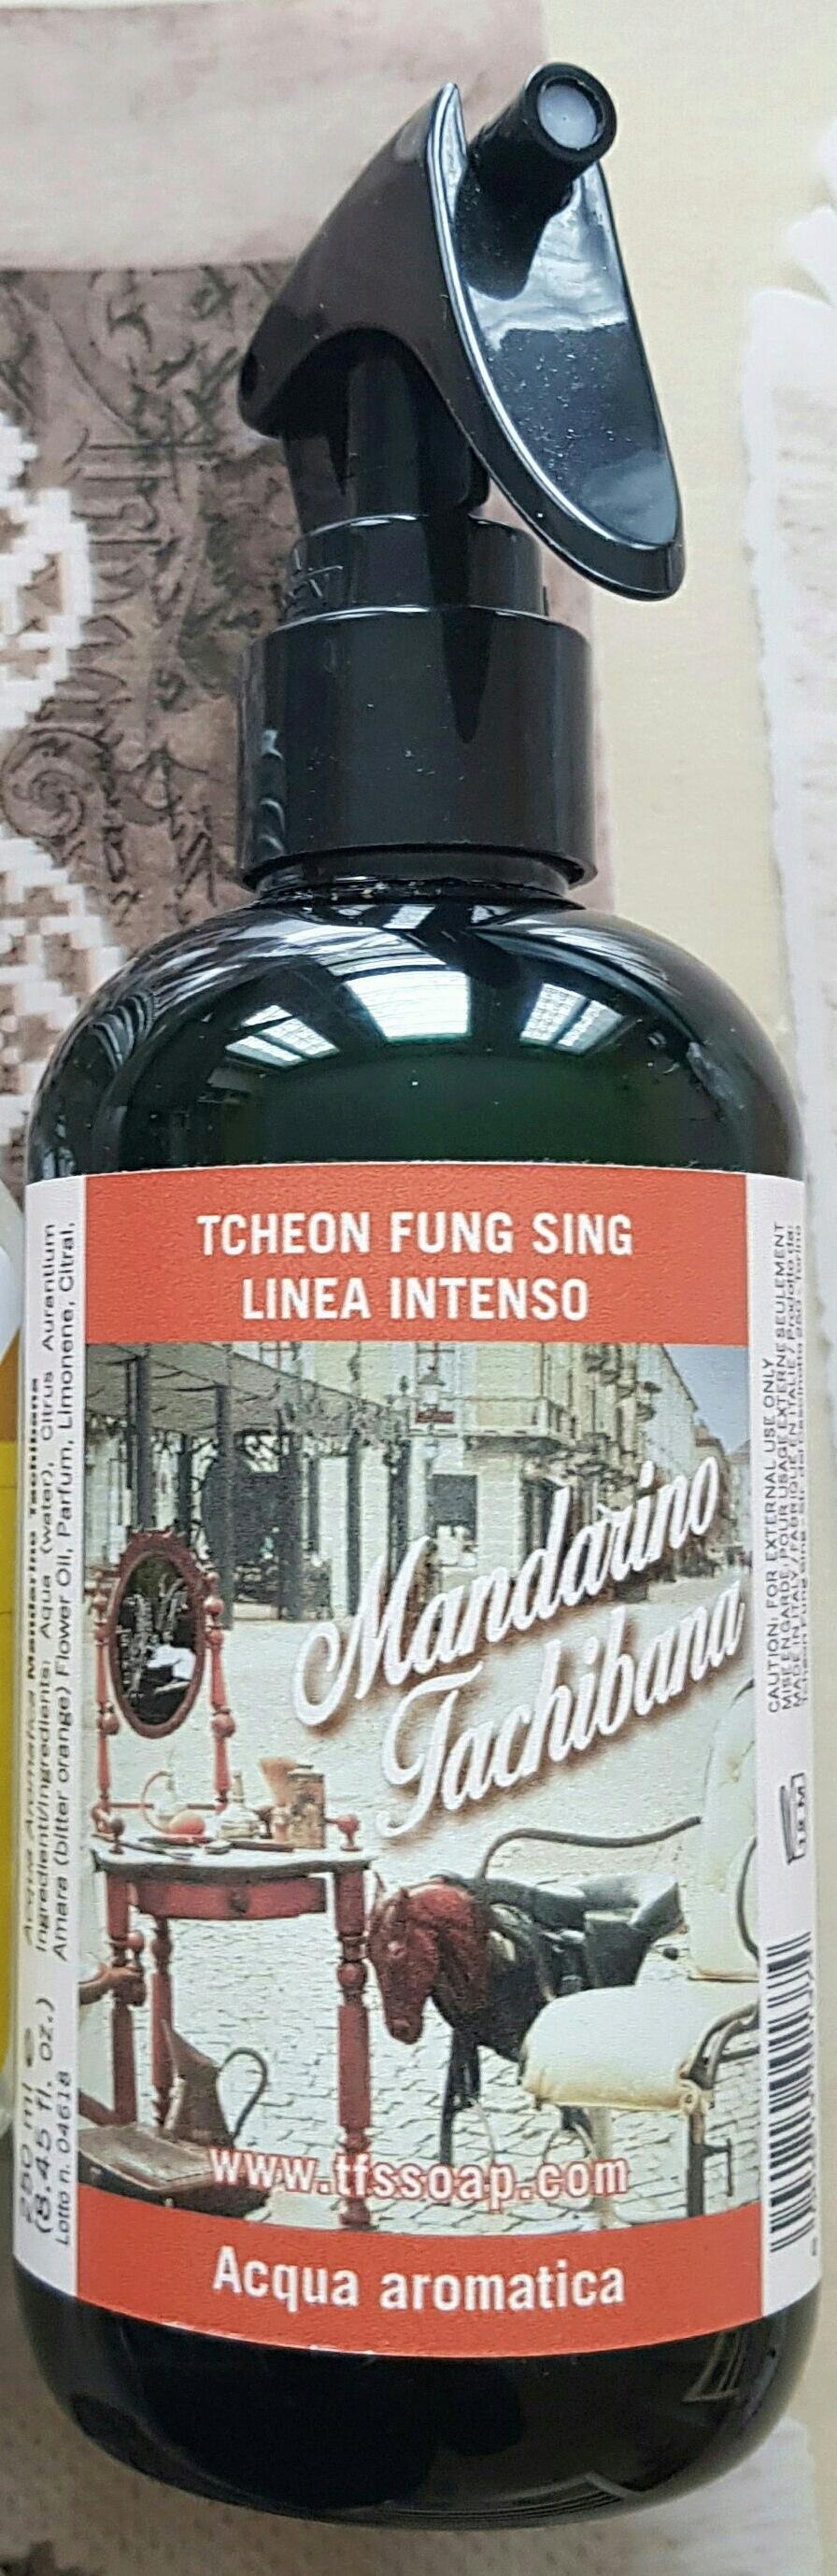 Eau aromatisée TFS - Tcheon Fung Sing Img_1157